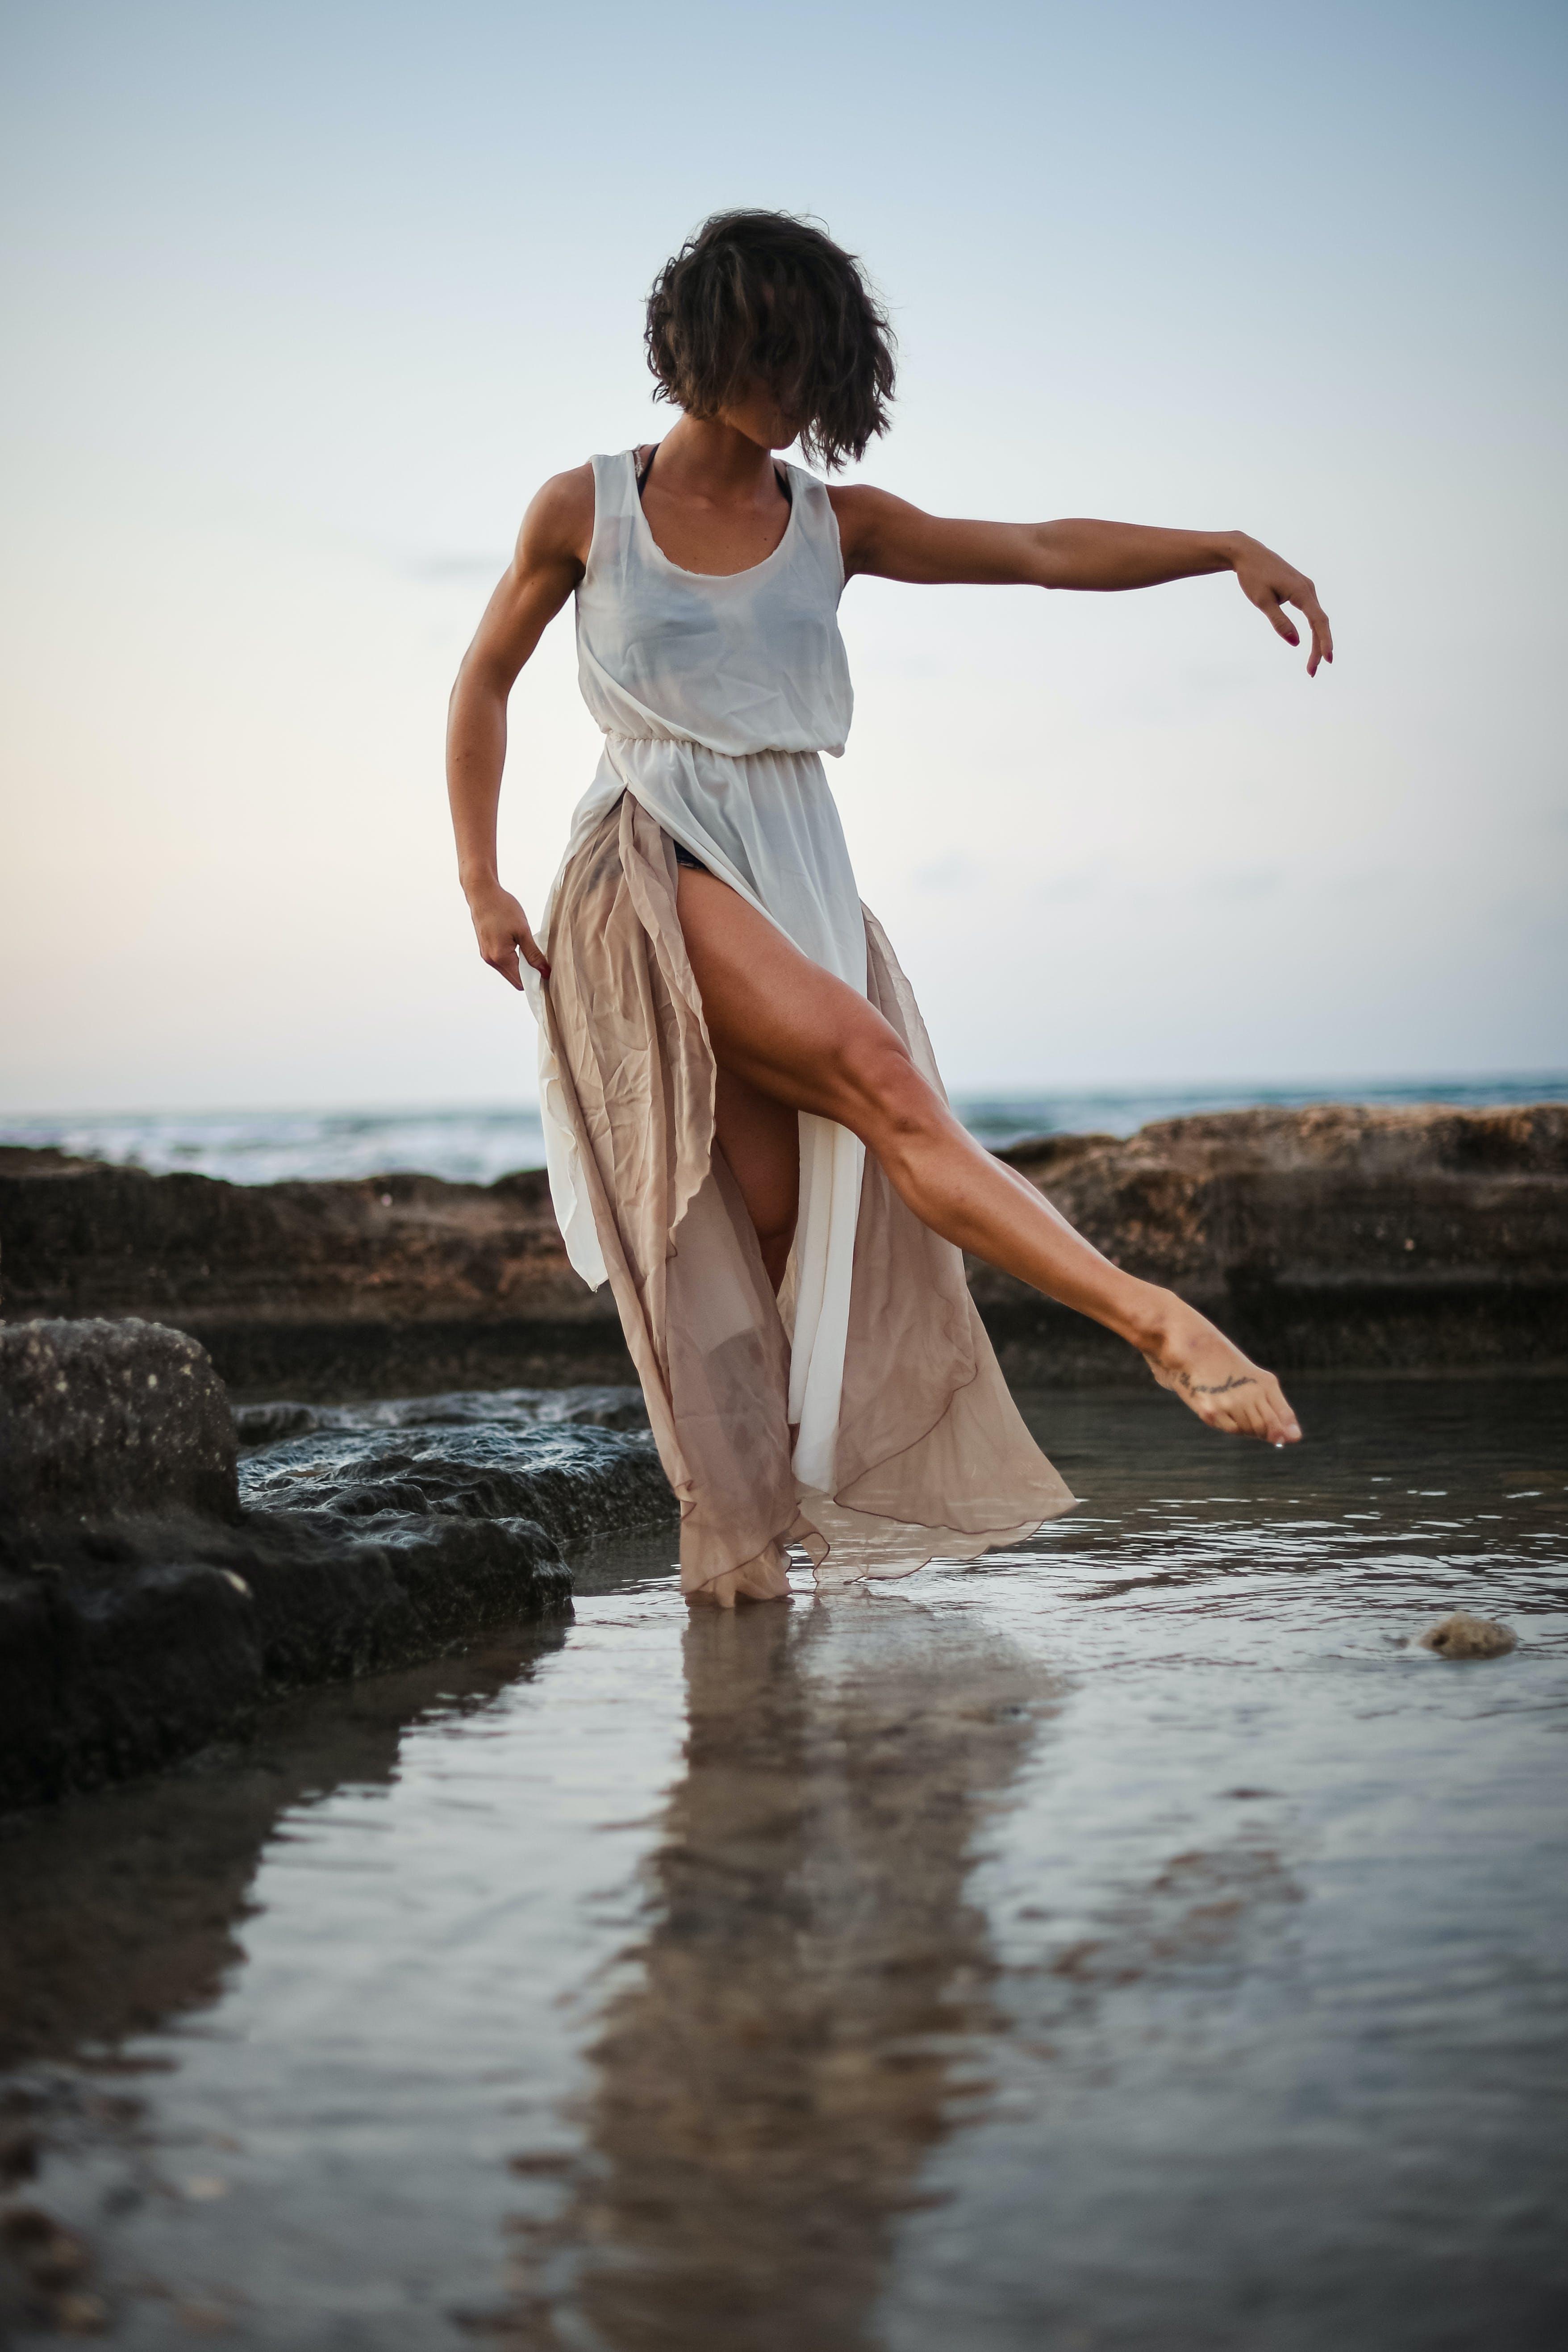 Woman Wearing White Tank Dress Posing in Body of Water